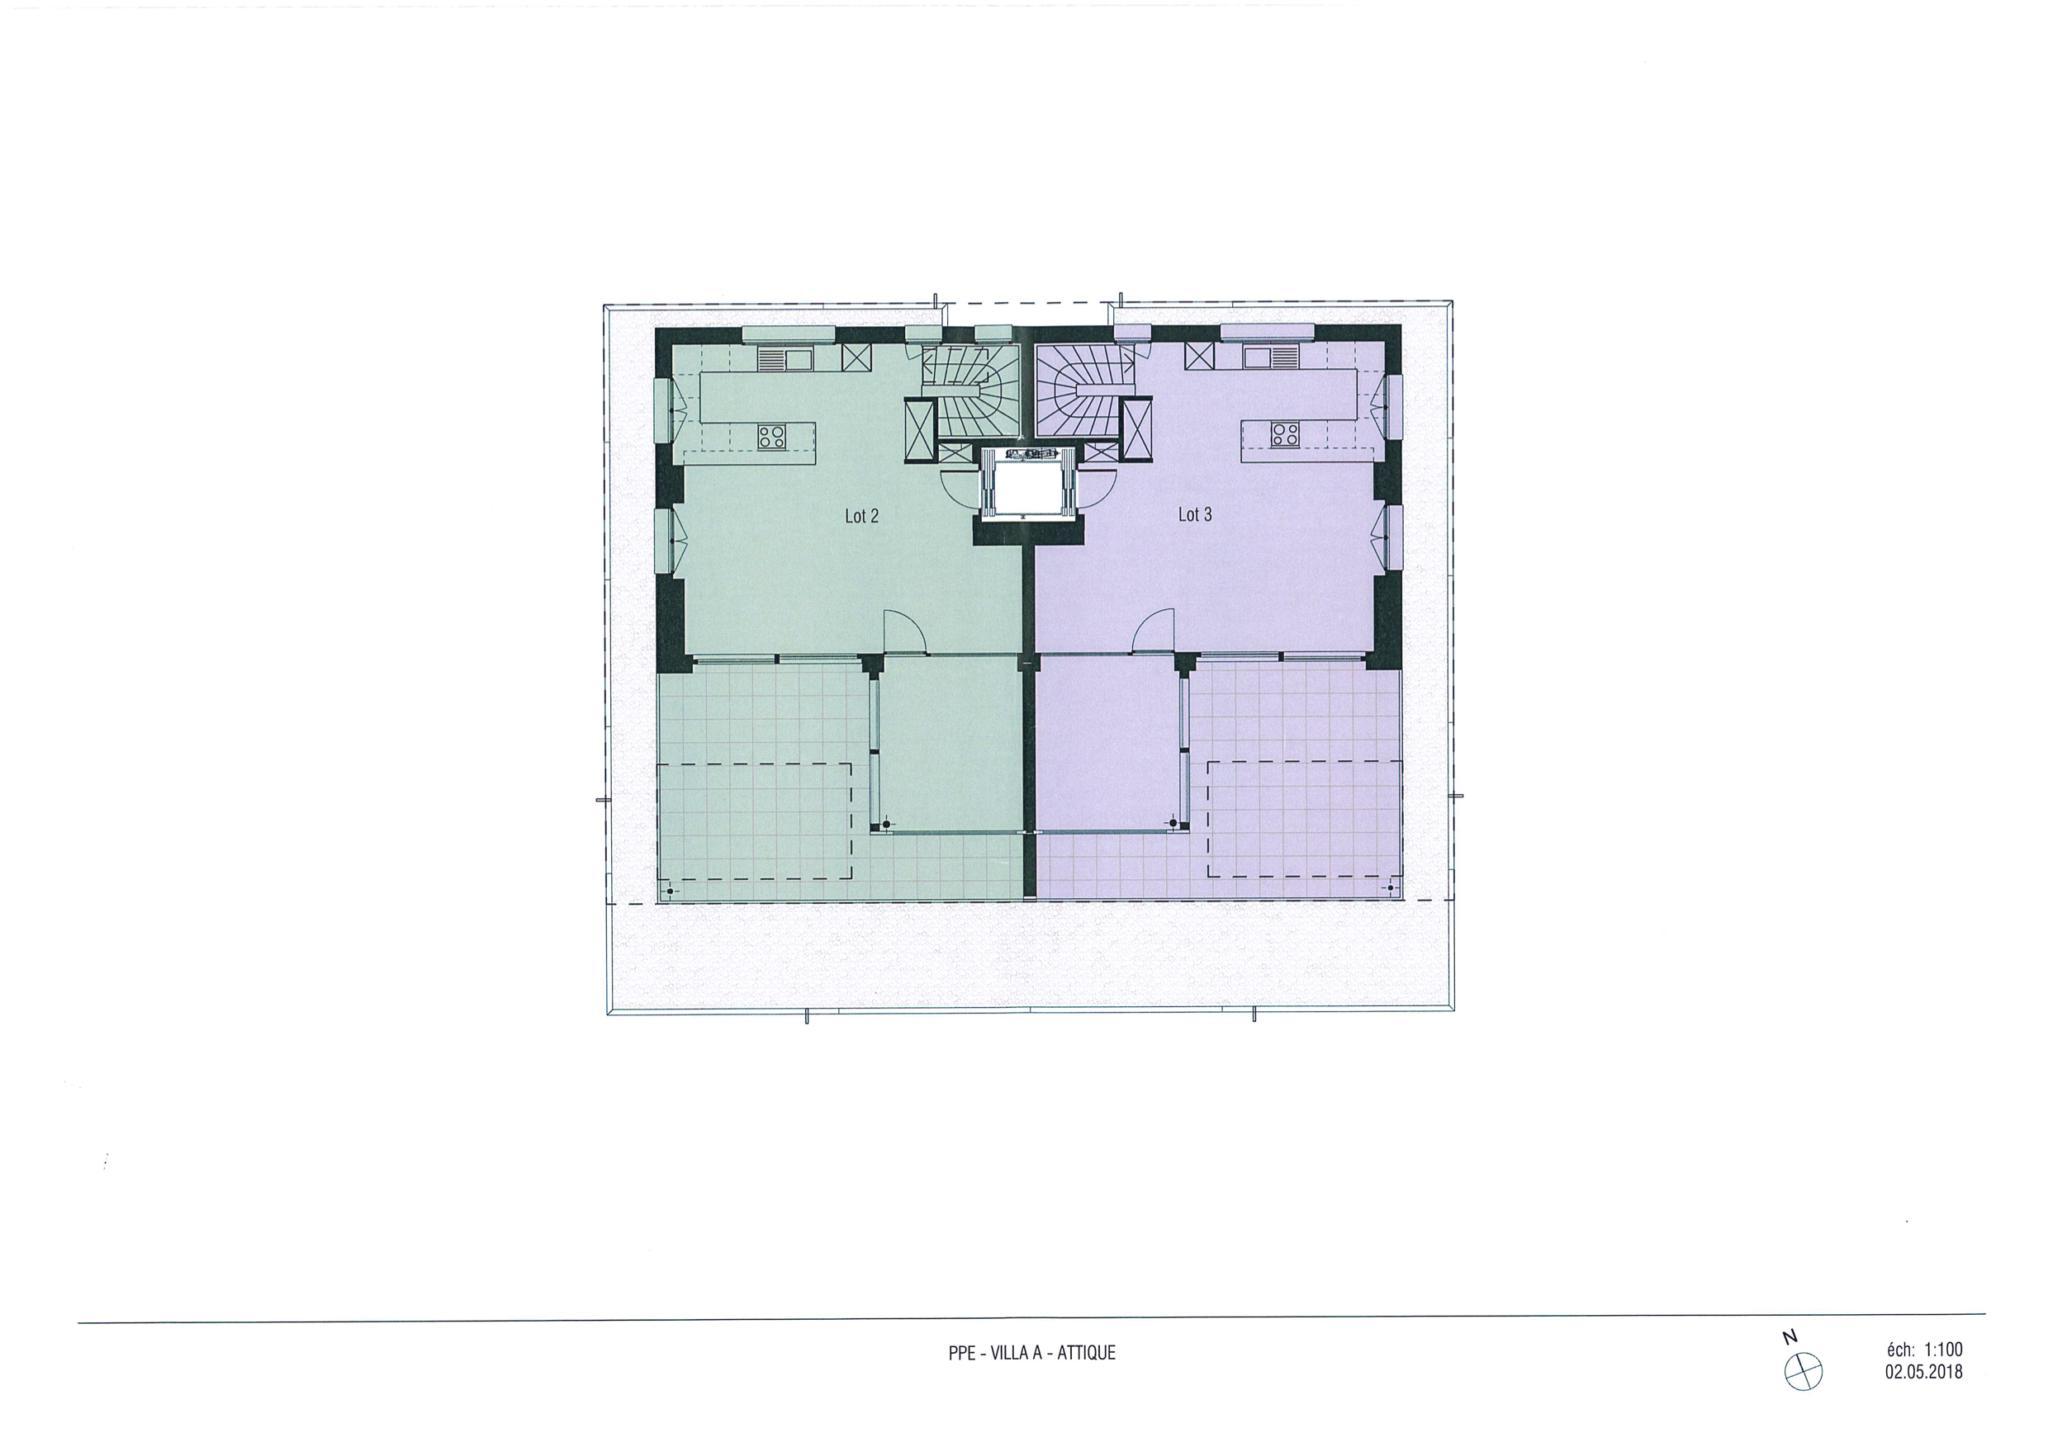 BC Immo - Magnifique appartement neuf avec ascenseur privatif - 1009A3VIDA